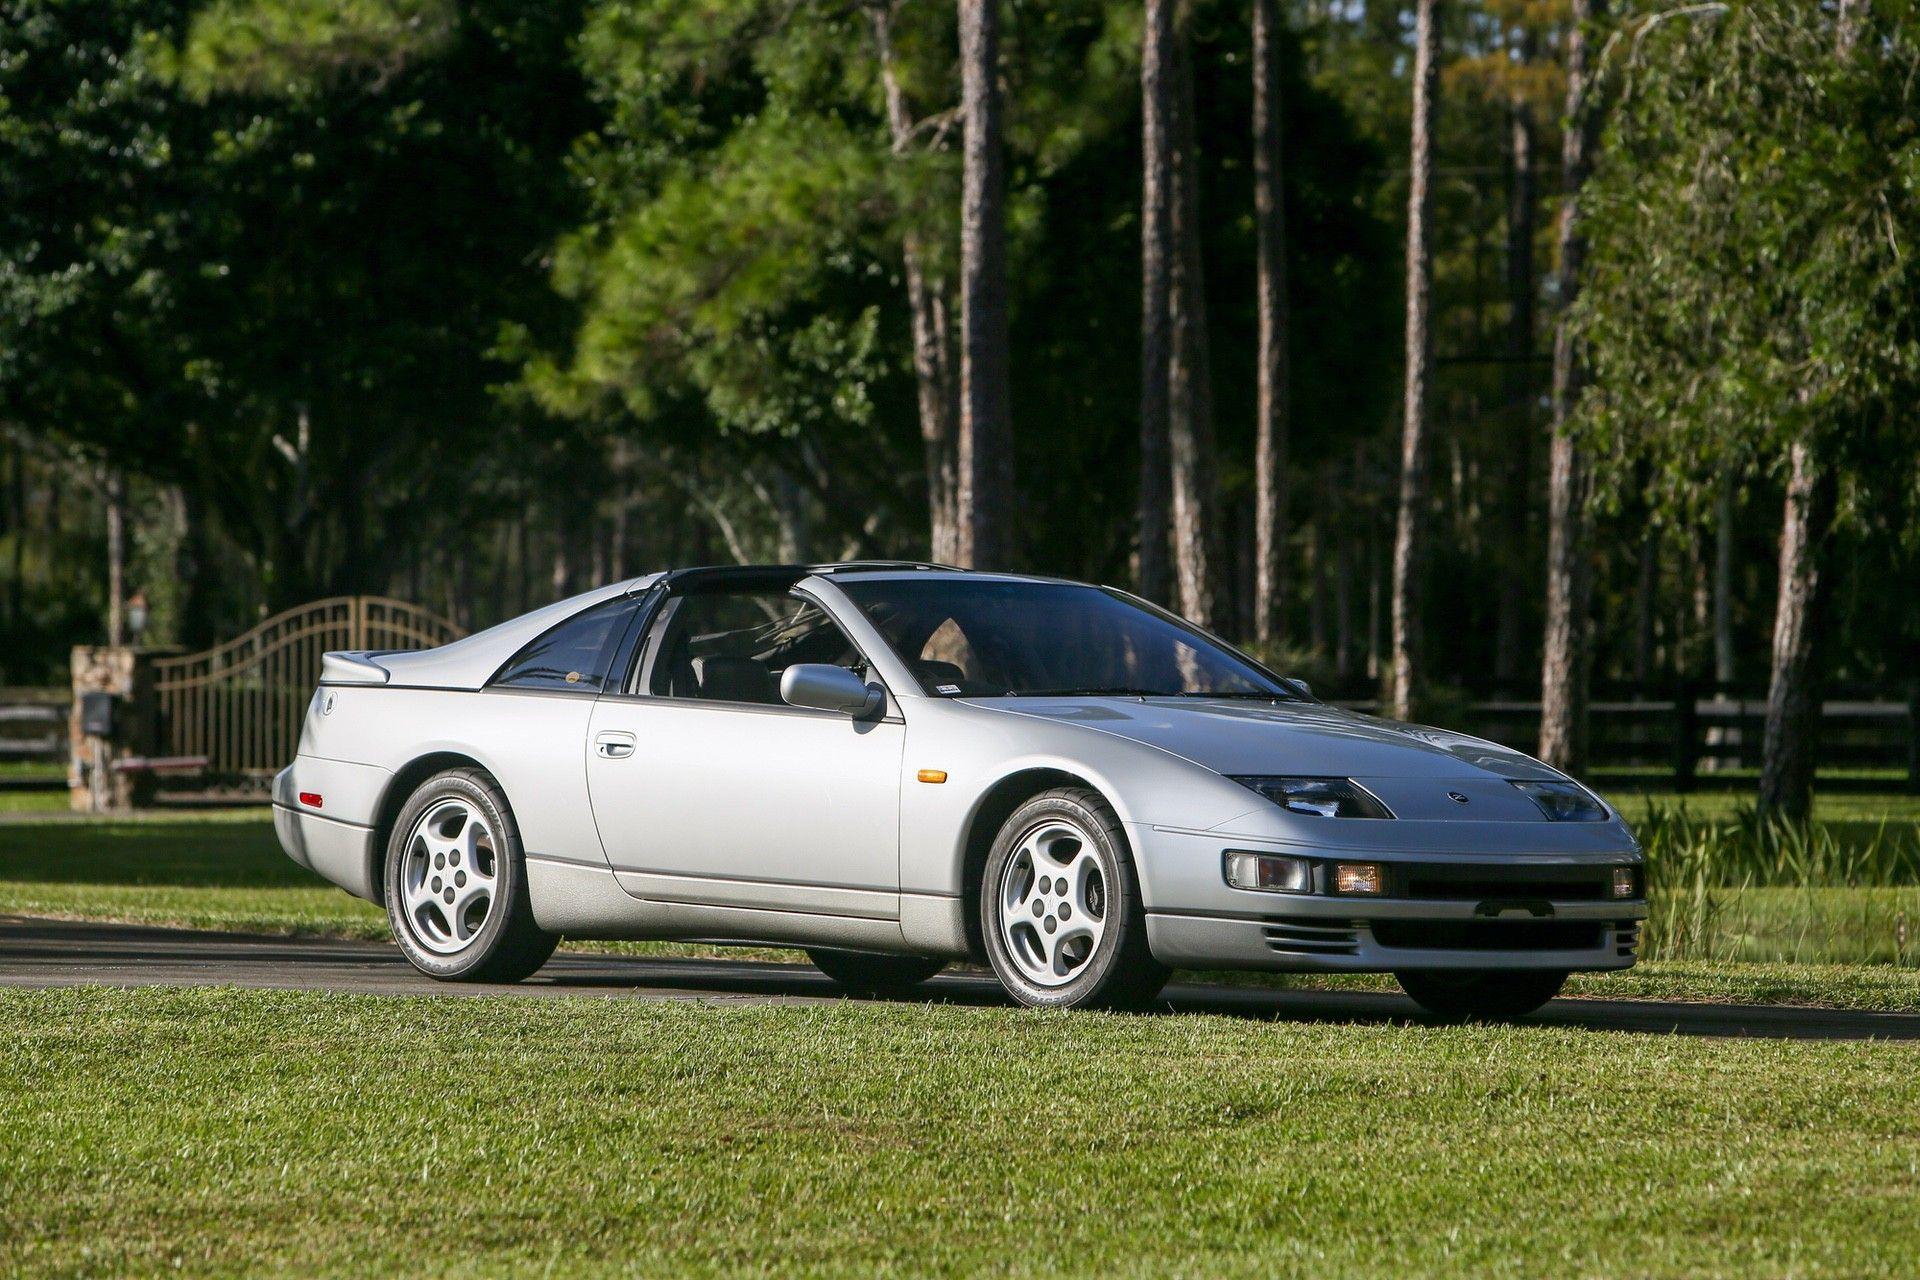 1990_Nissan_300ZX_auction_0009